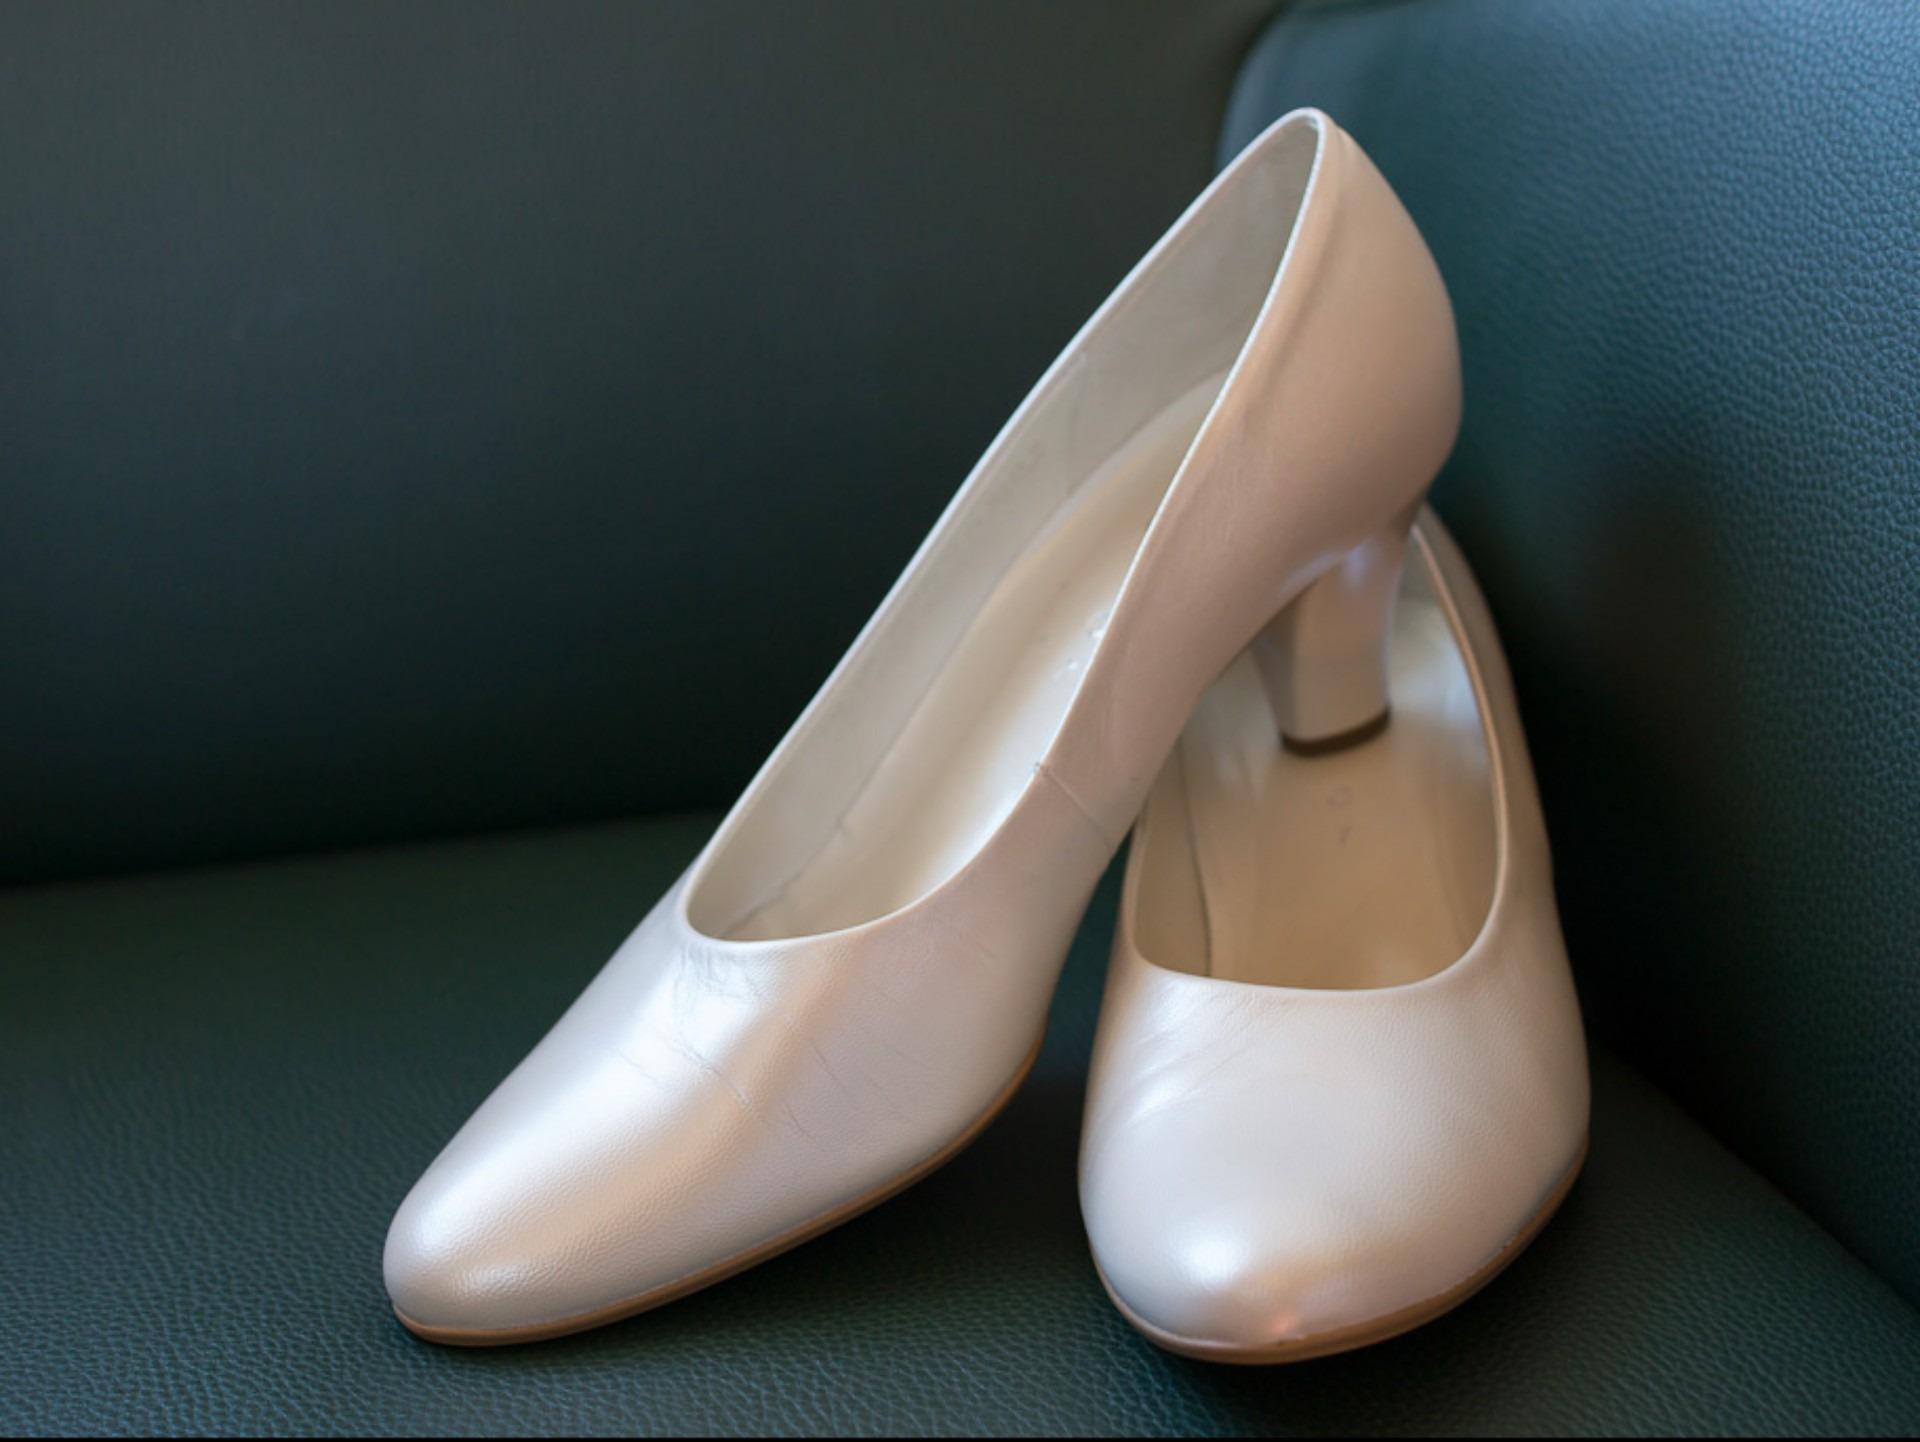 2fb3b79d4c5 구두 화이트 가죽 다리 발 혼례 인간의 몸 구두 신발류 높은 발가락 여성 신발 하이힐